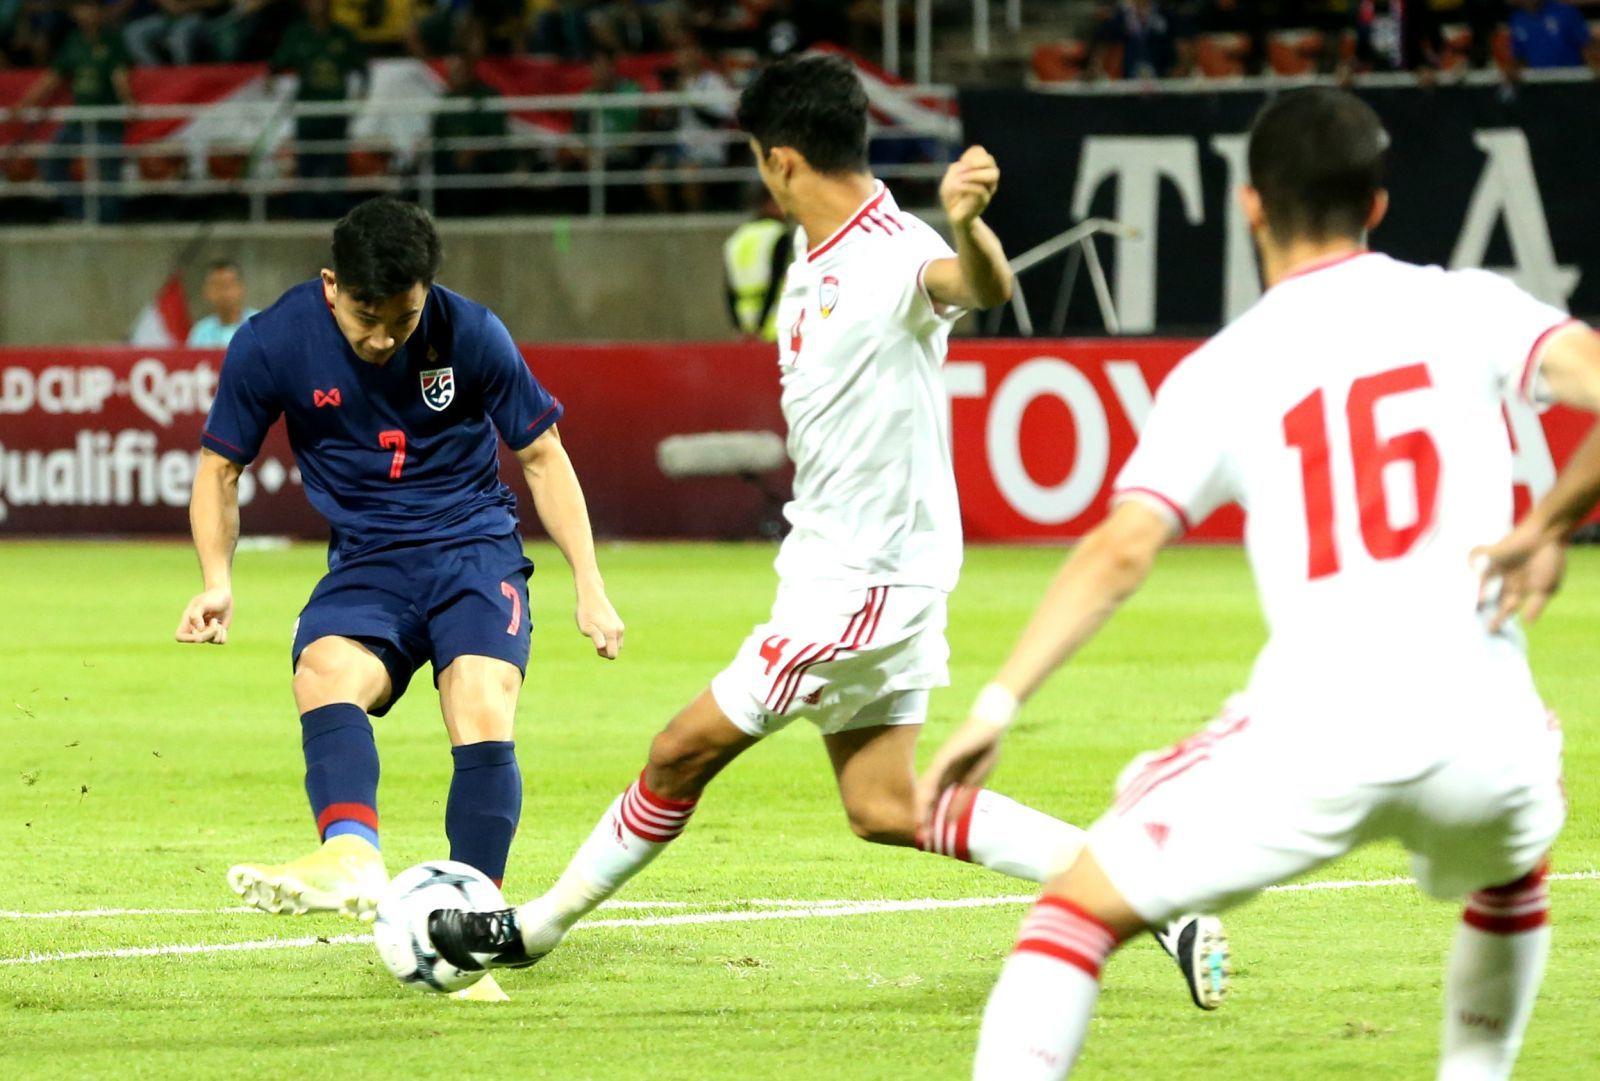 viet nam hay doi nao co nhieu loi the nhat tai vong loai world cup 2022